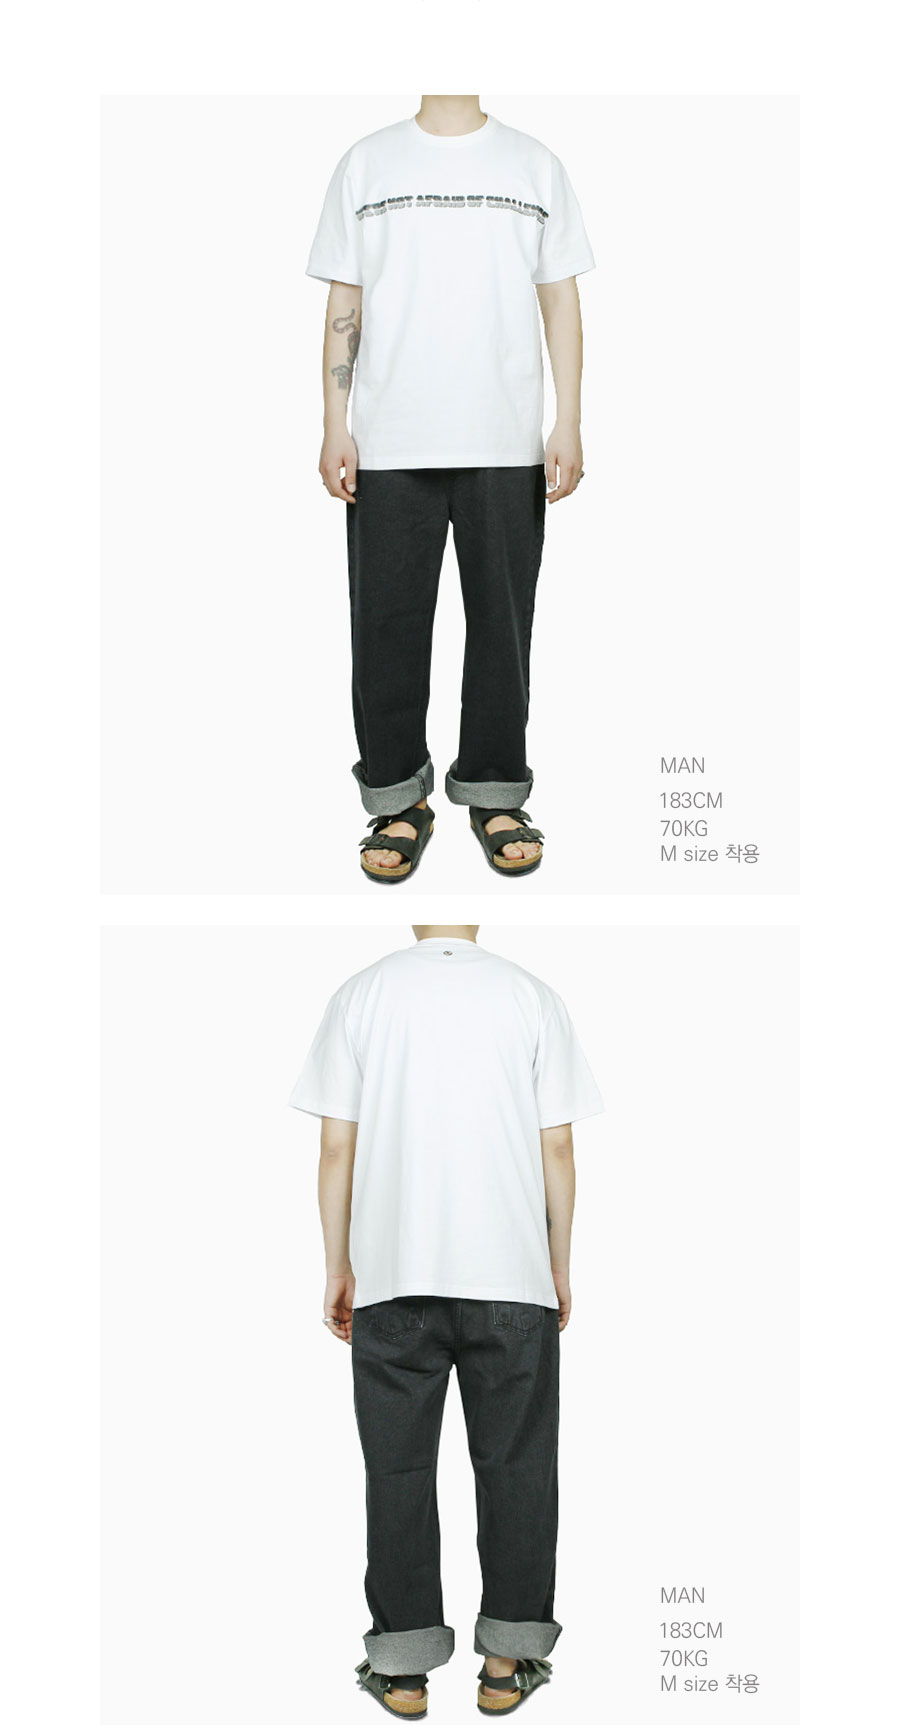 XTT027 스카치 나염 반팔 티셔츠 (WHITE)